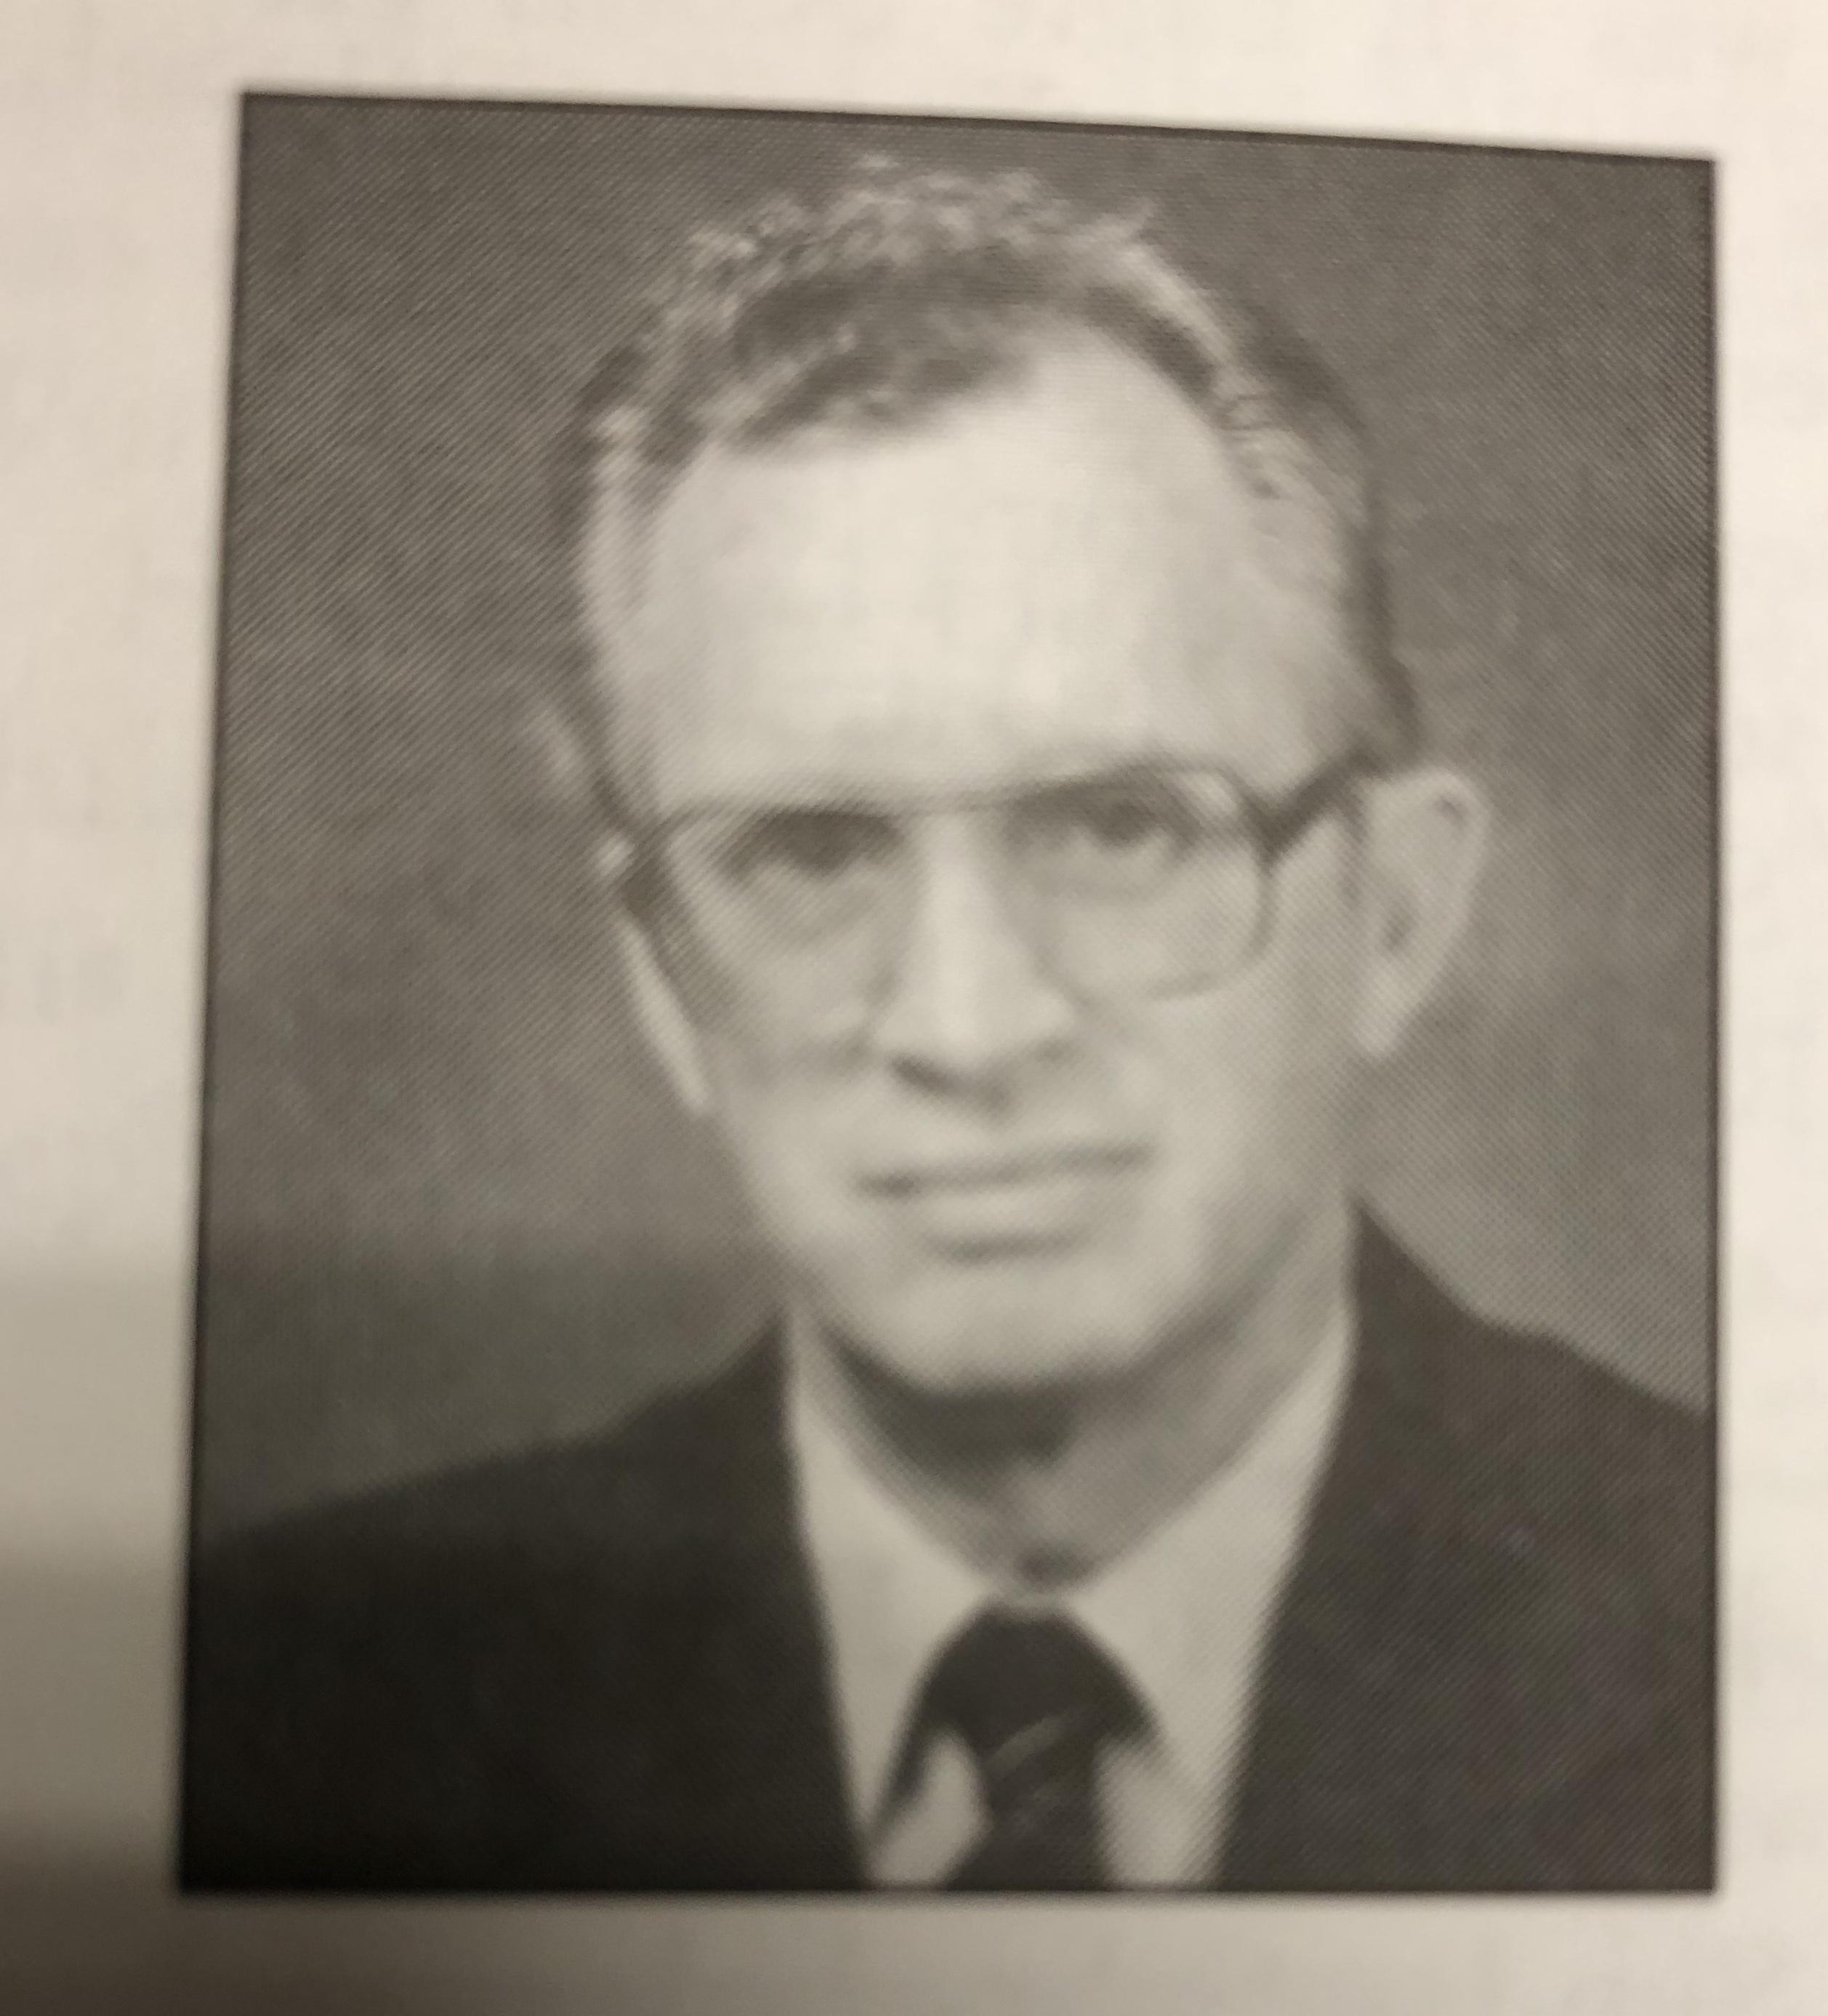 Reverend David R. Ellis